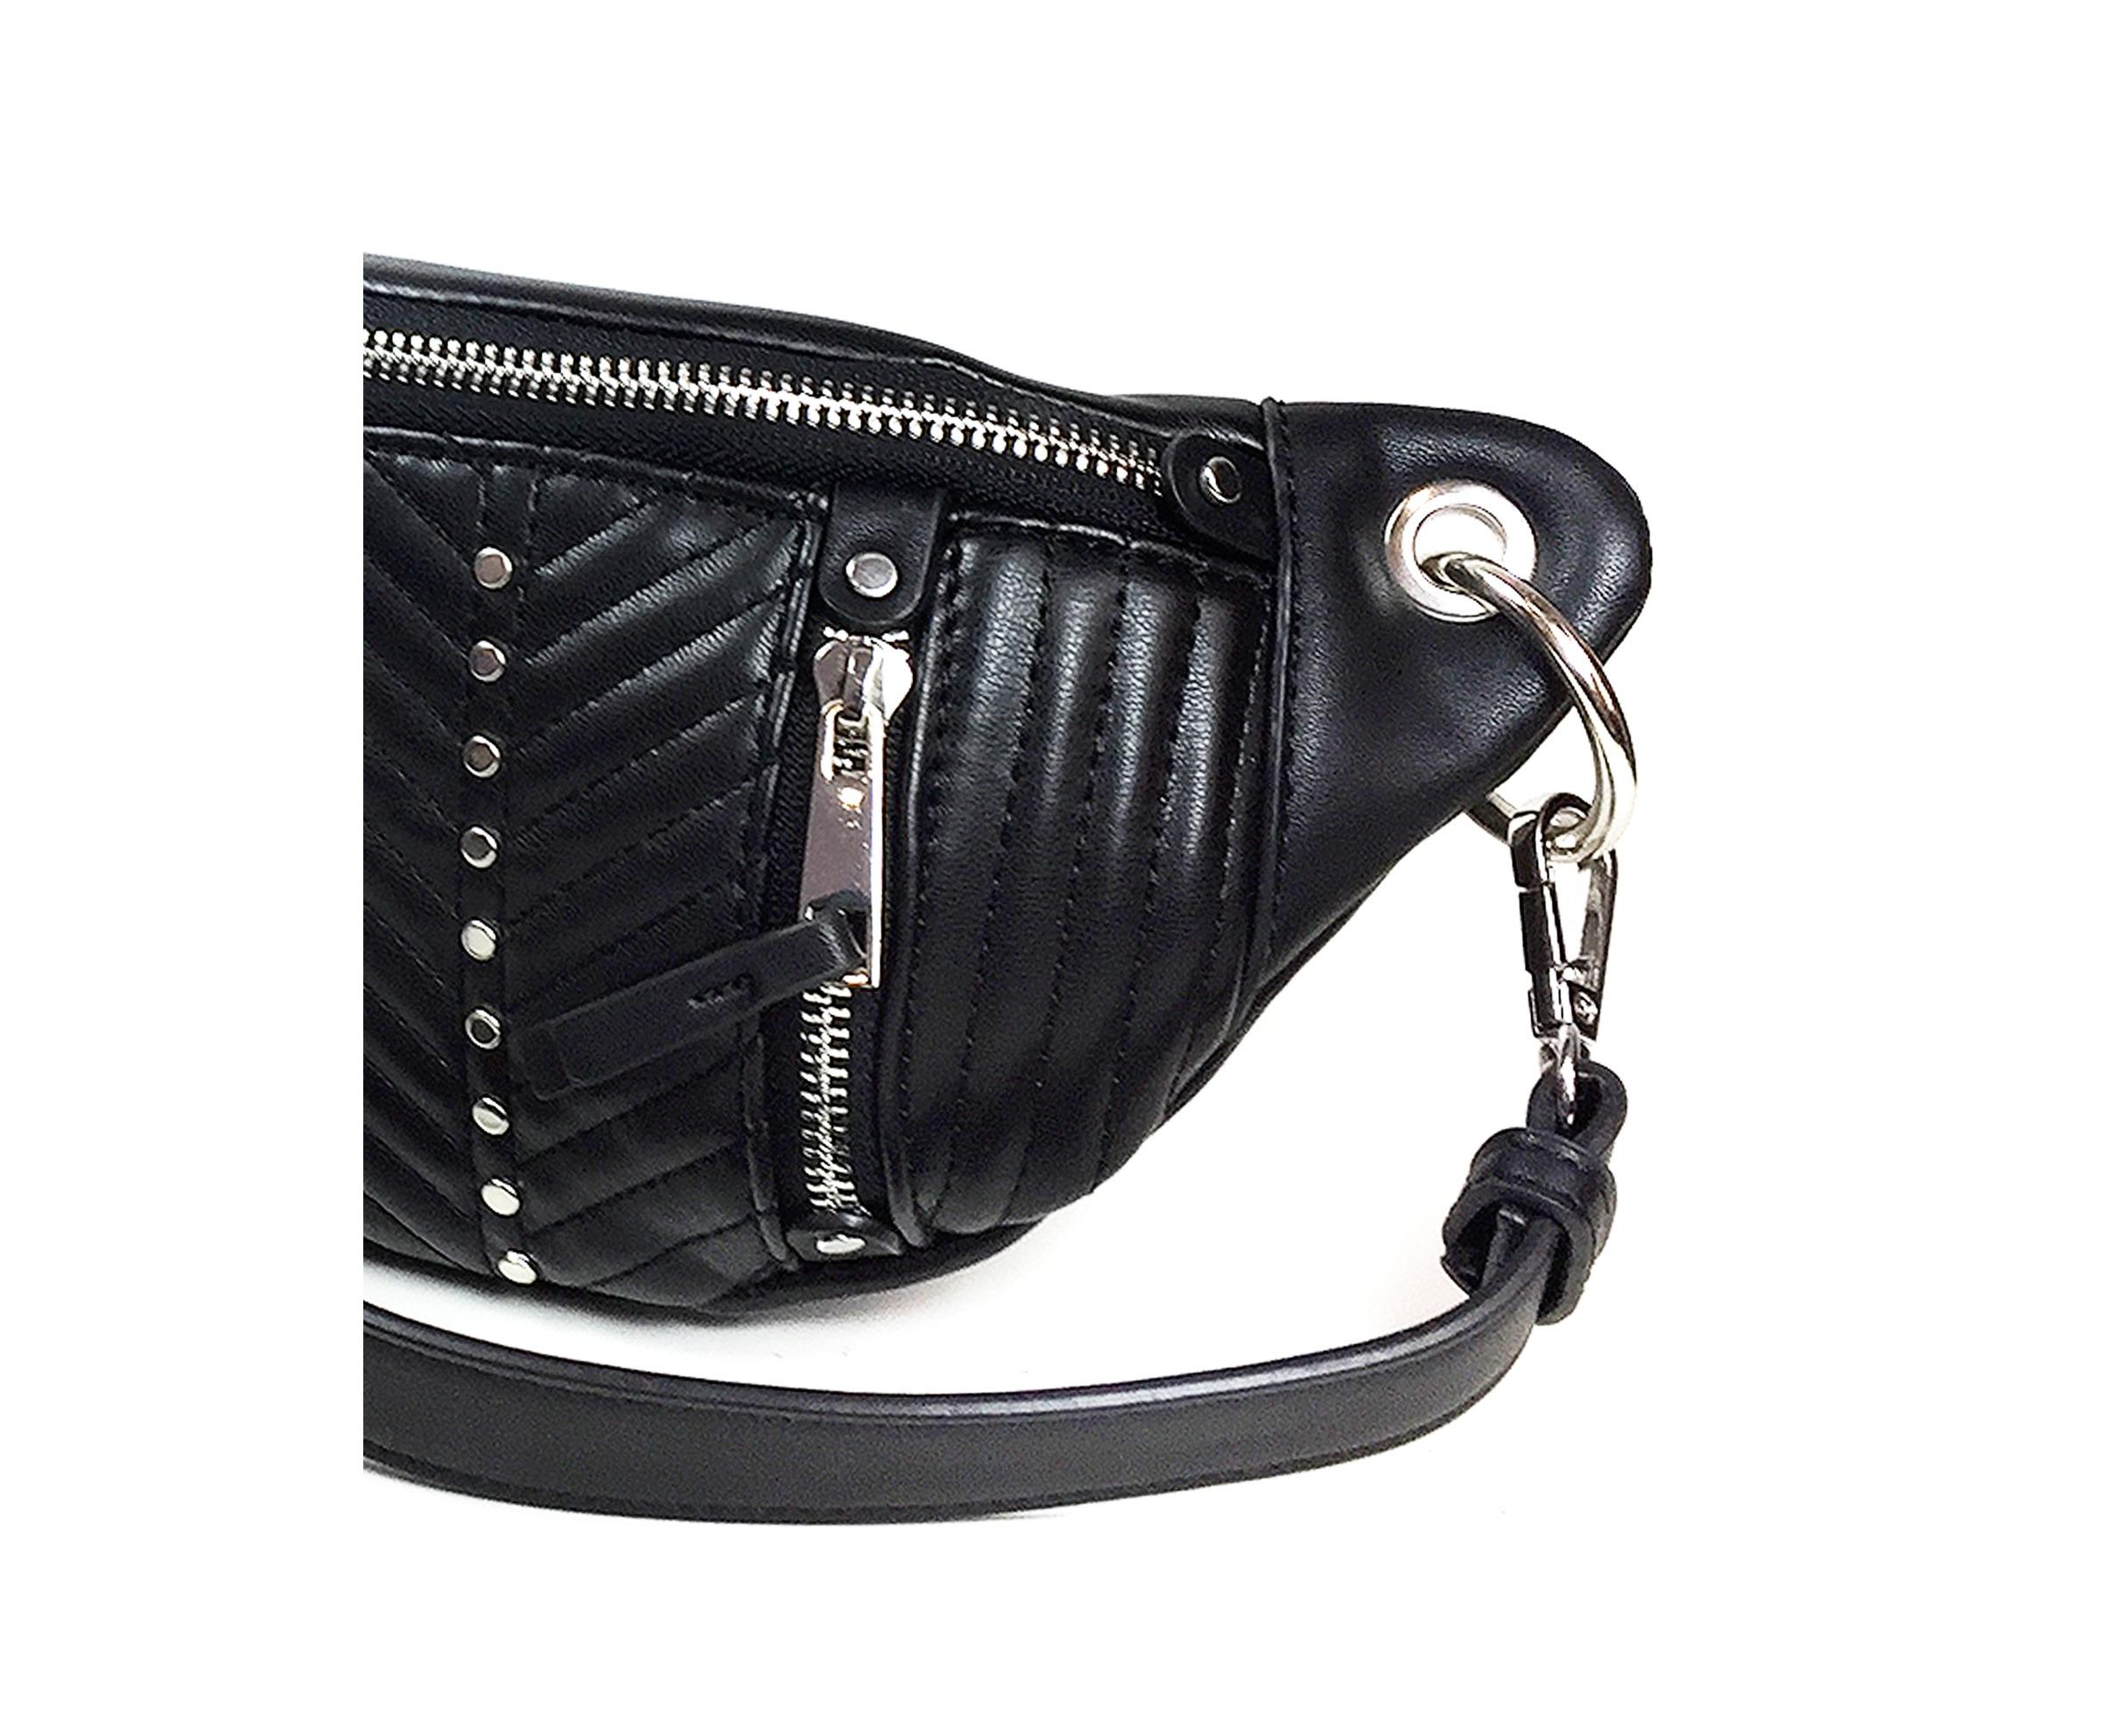 4c2a18f84366 Zara Women Belt bag with zips 6424/304